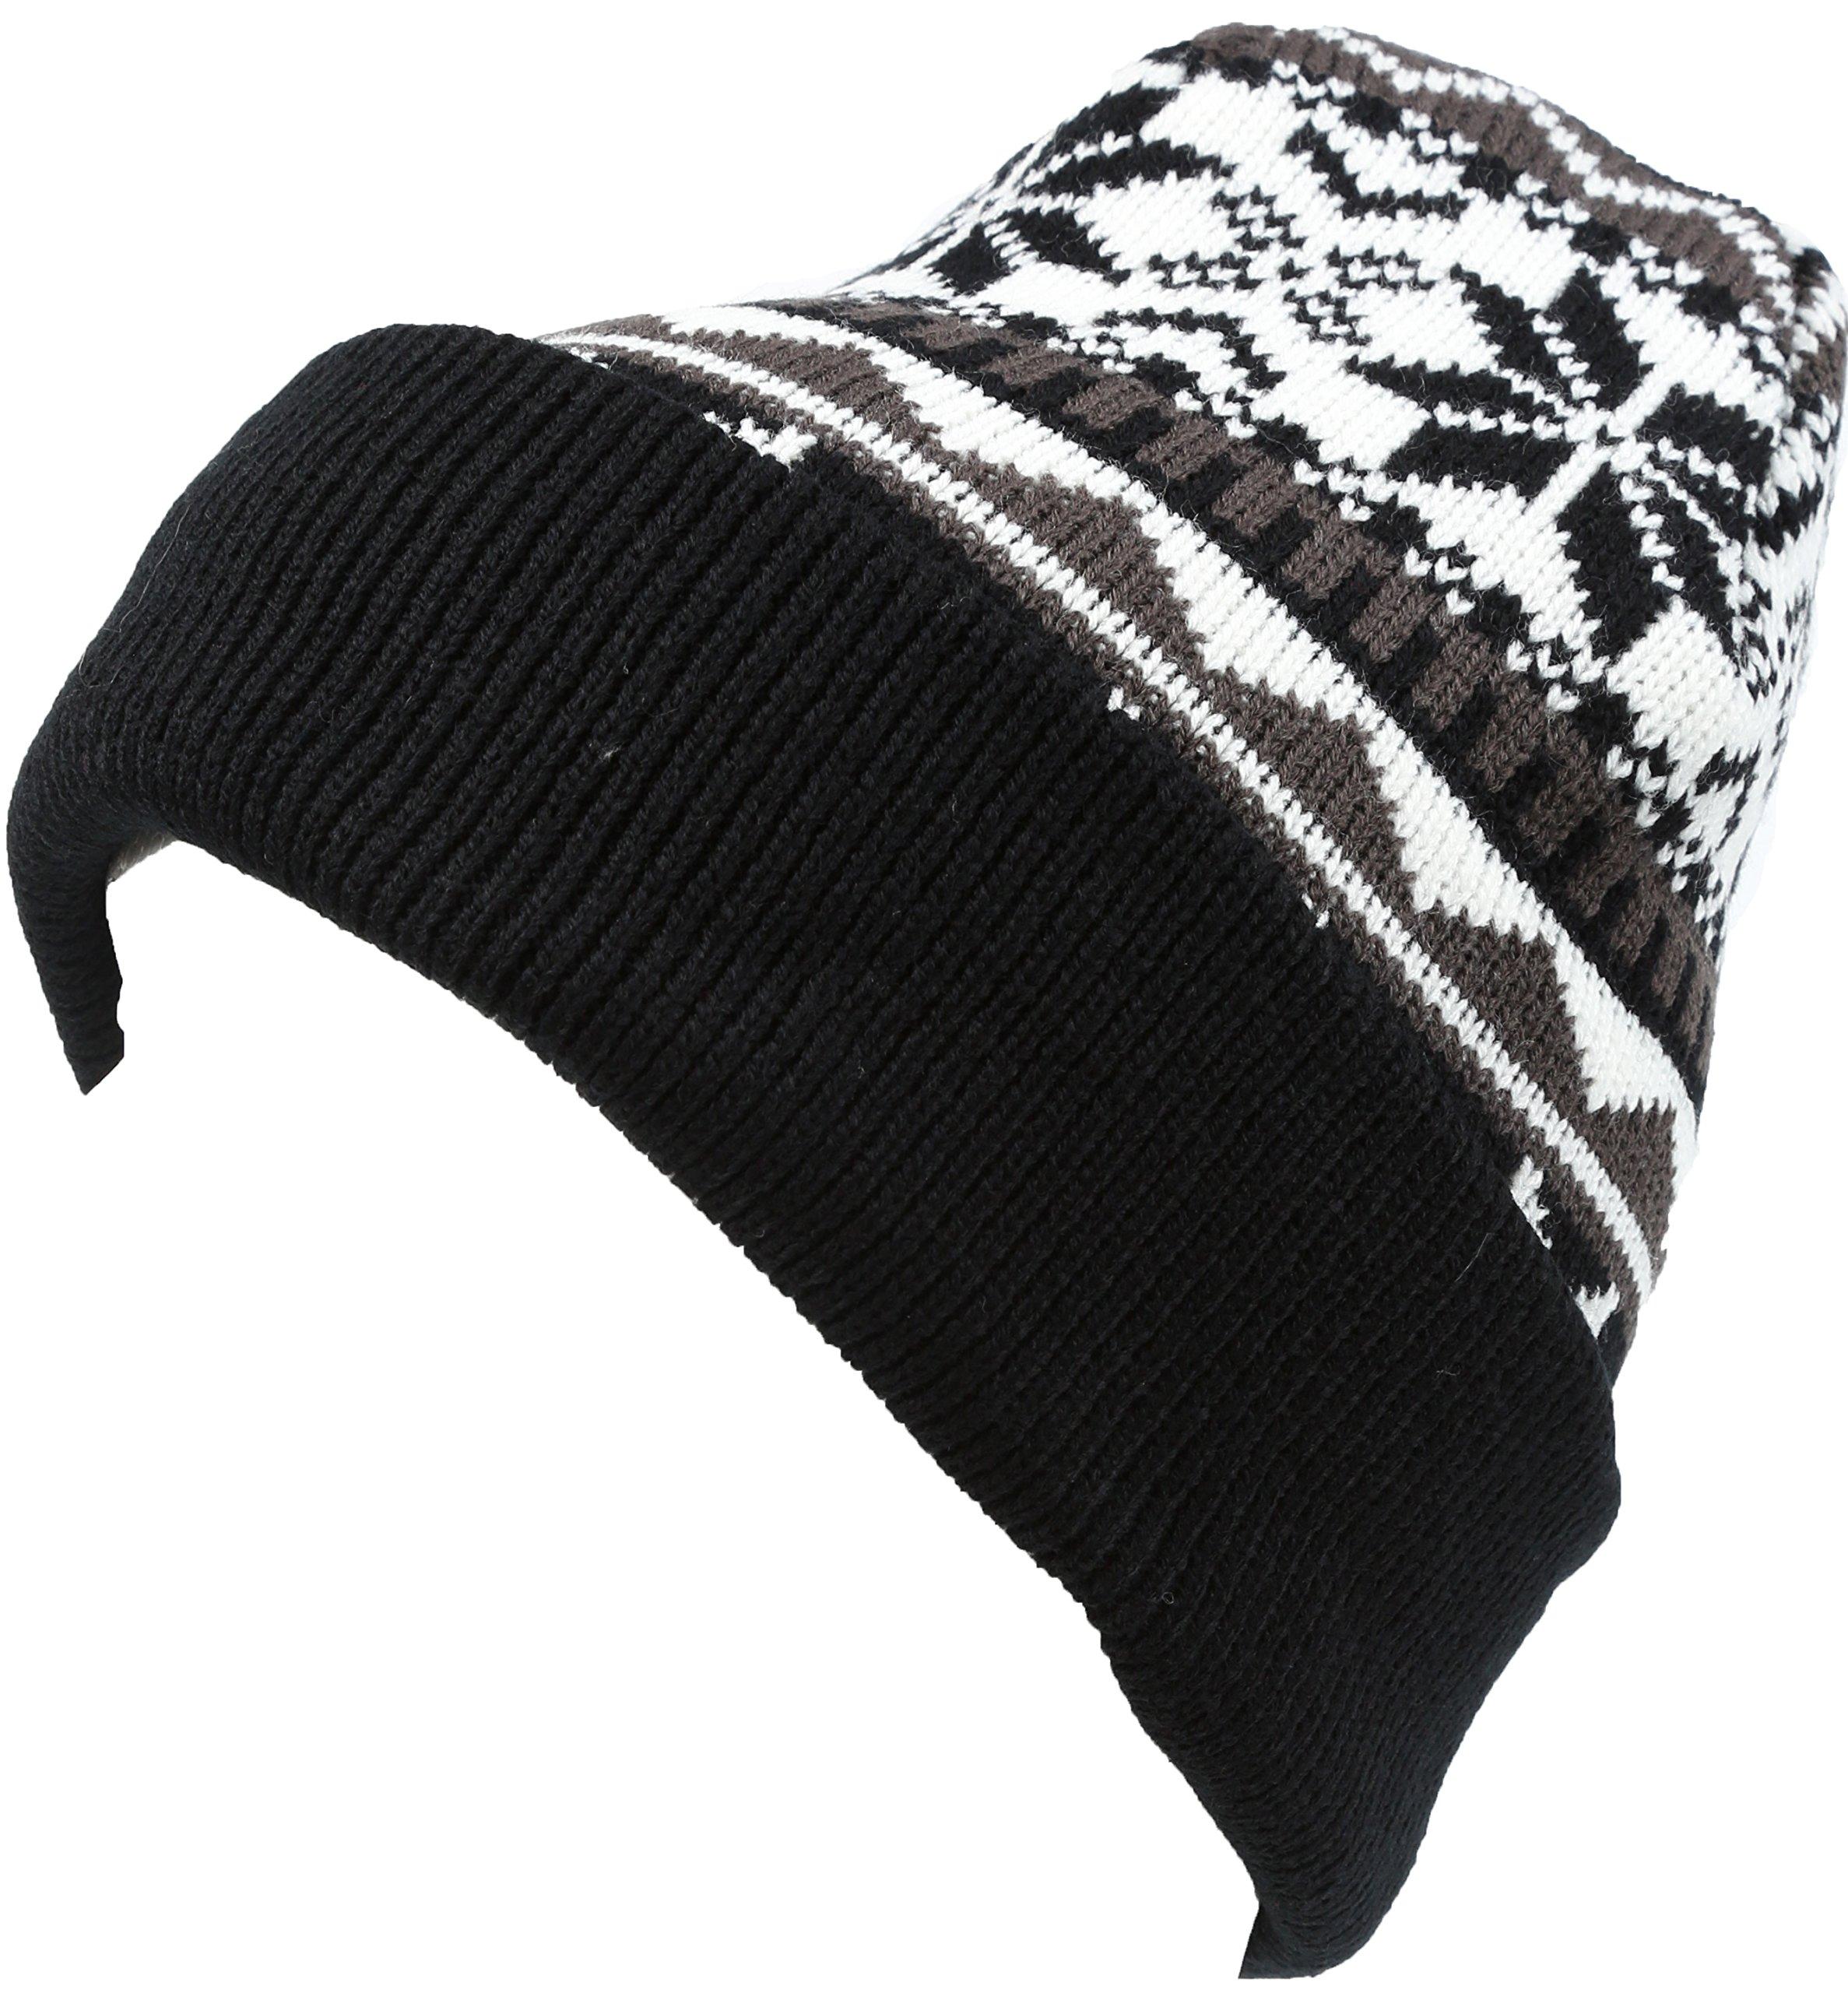 Sakkas 16153 - Sloan Unisex Fold Over Classic Patterned Snowflake Design Winter Beanie Hat - Black - OS